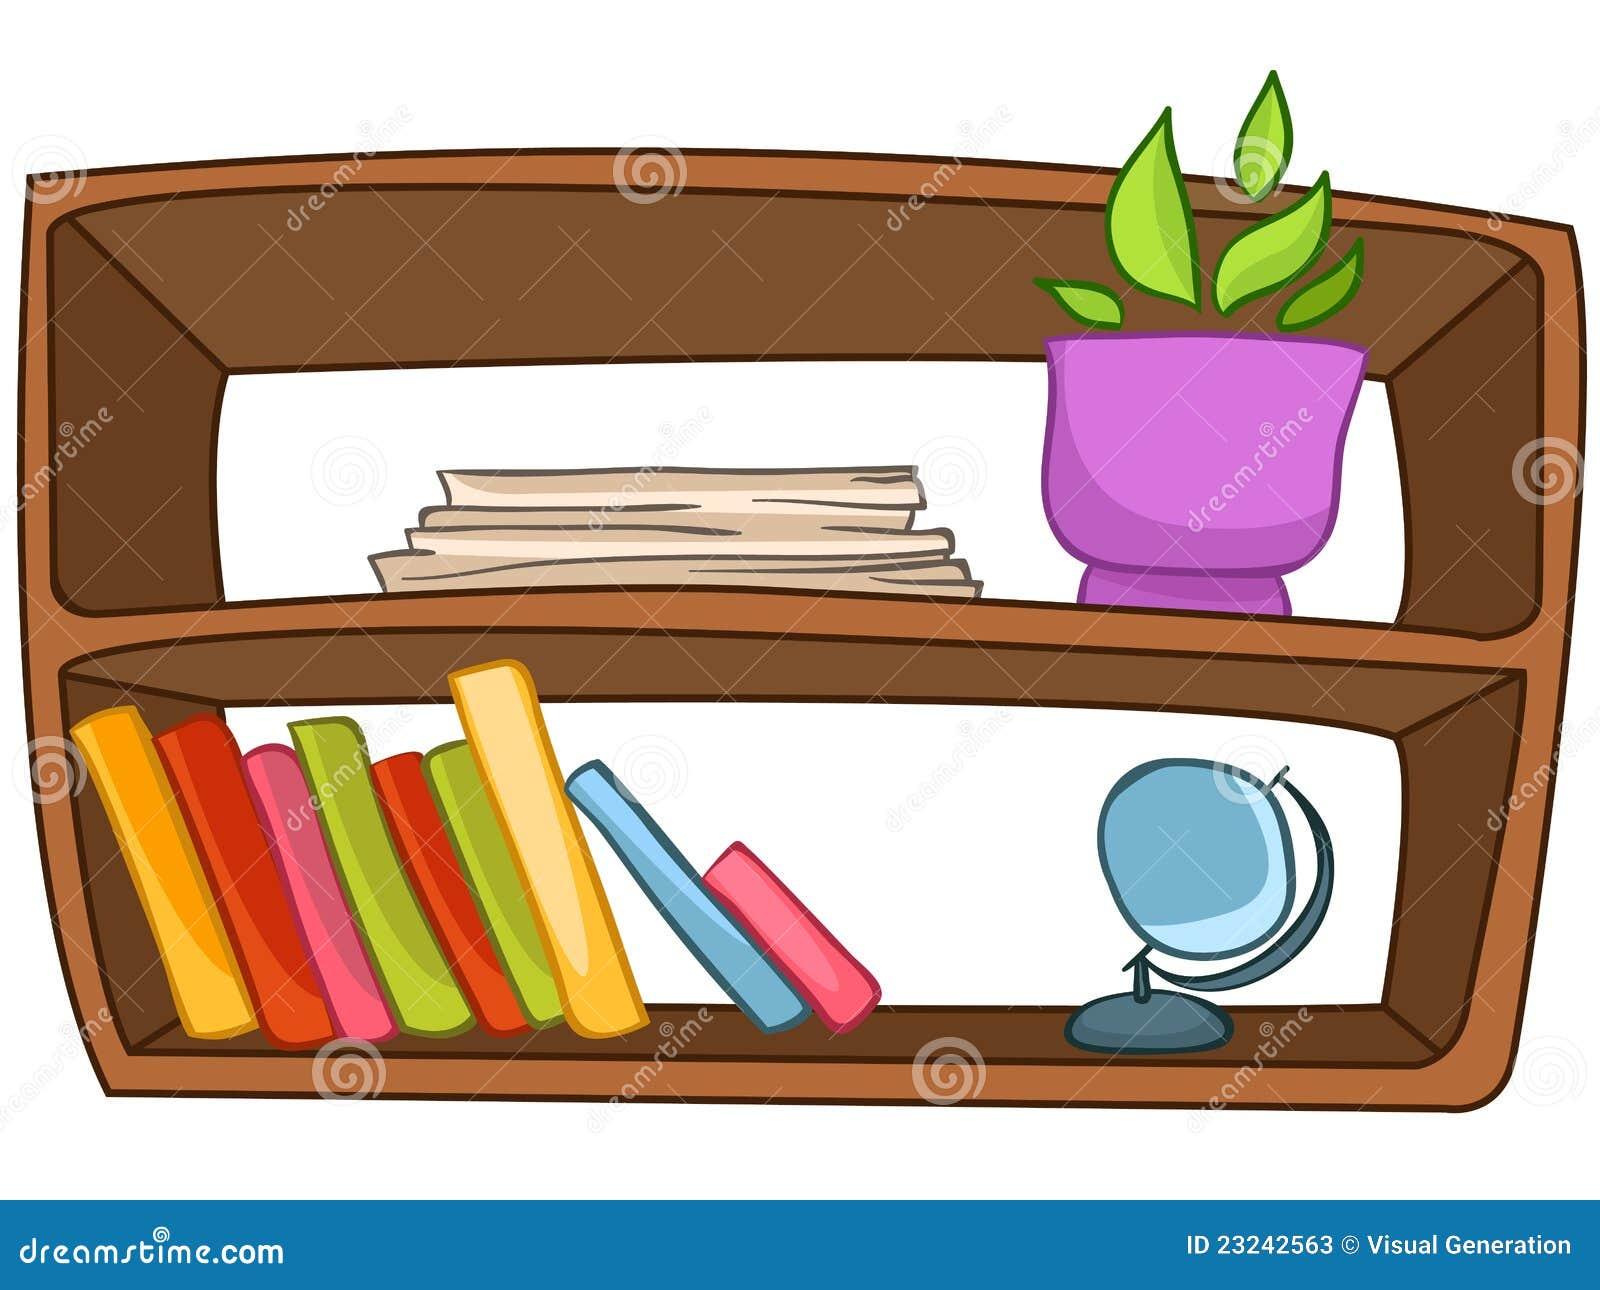 Cartoon Home Furniture Book Shelf Stock Vector